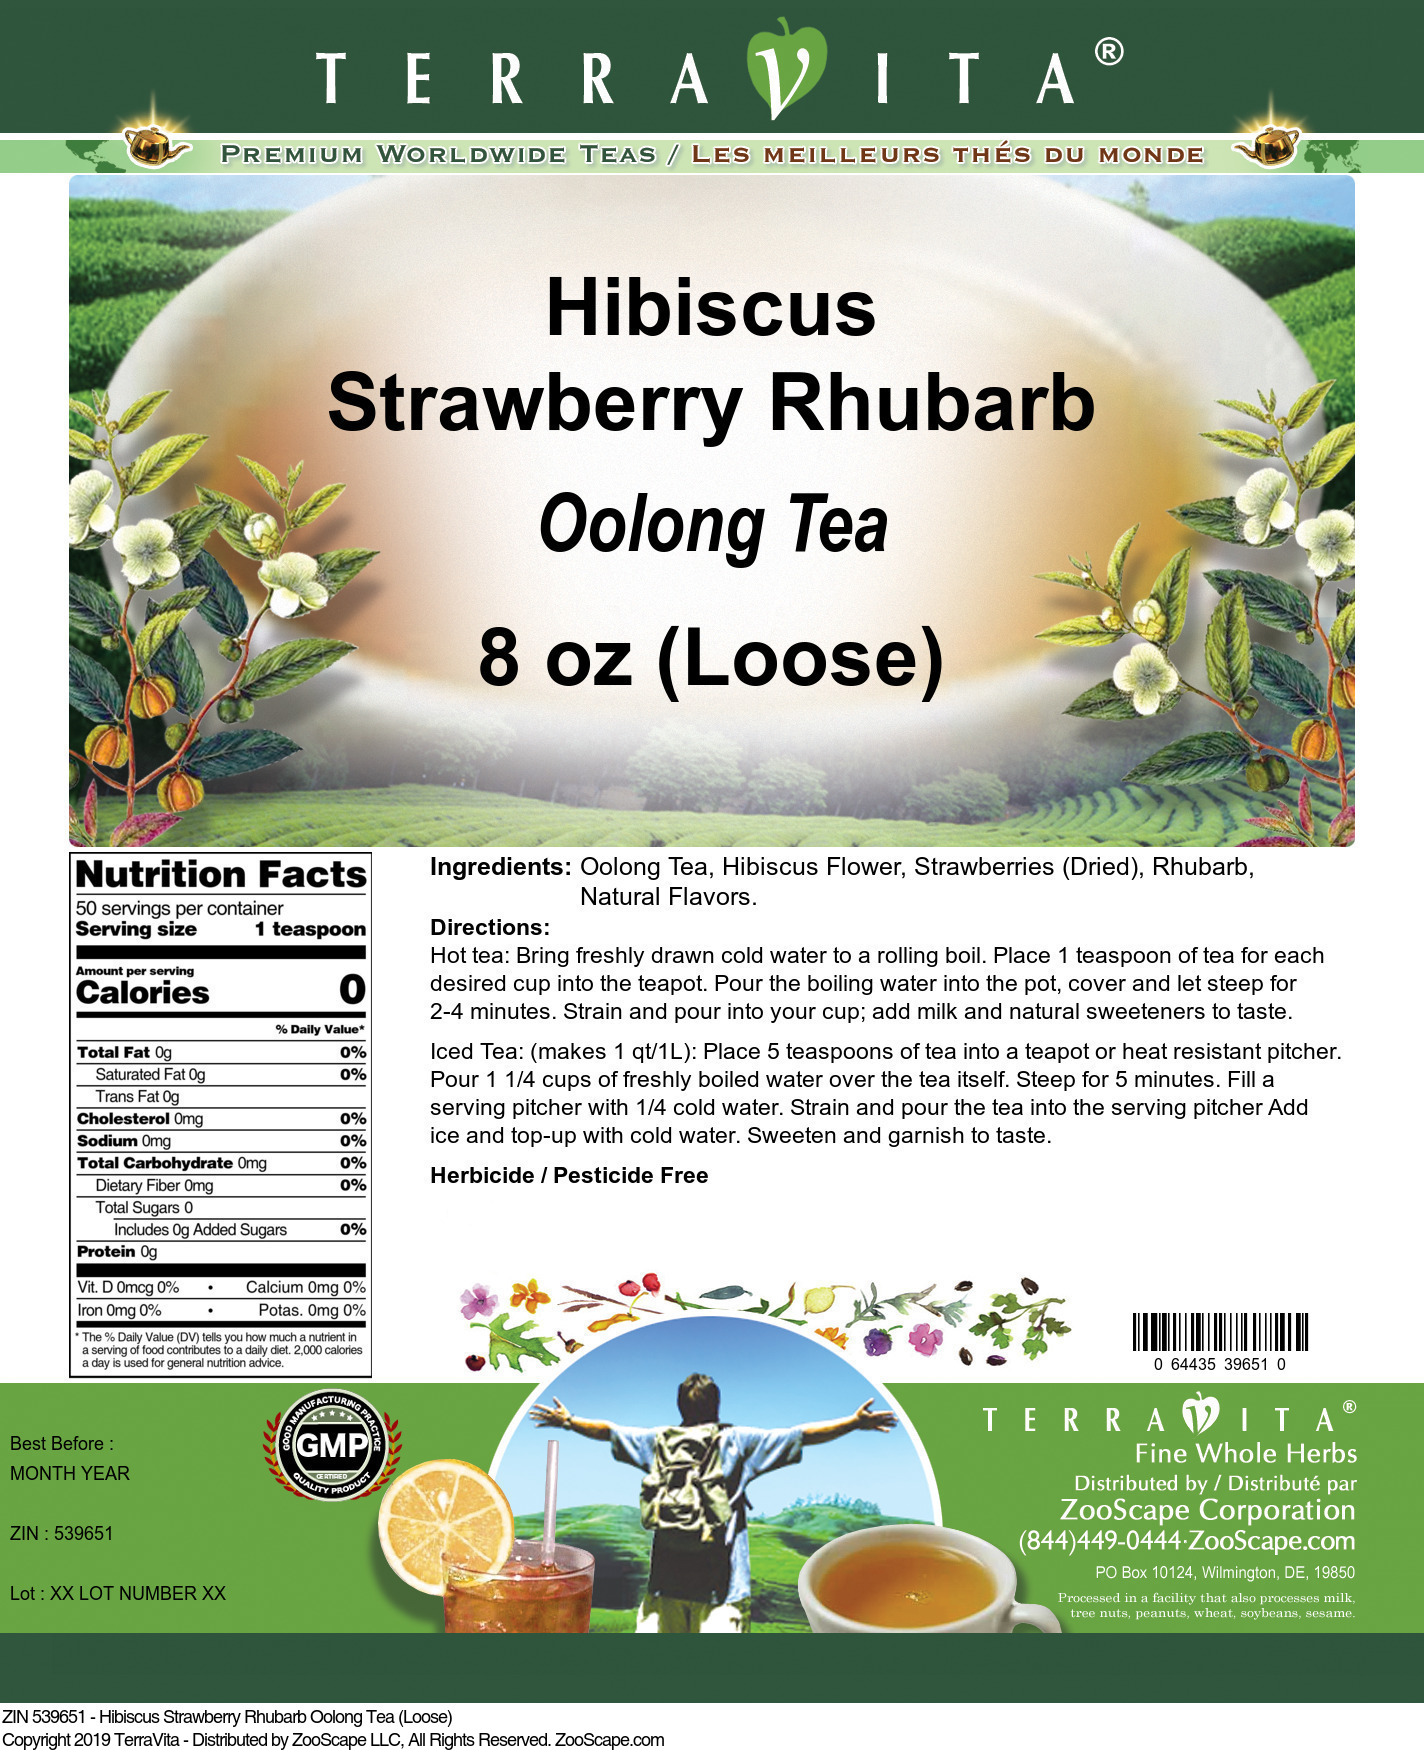 Hibiscus Strawberry Rhubarb Oolong Tea